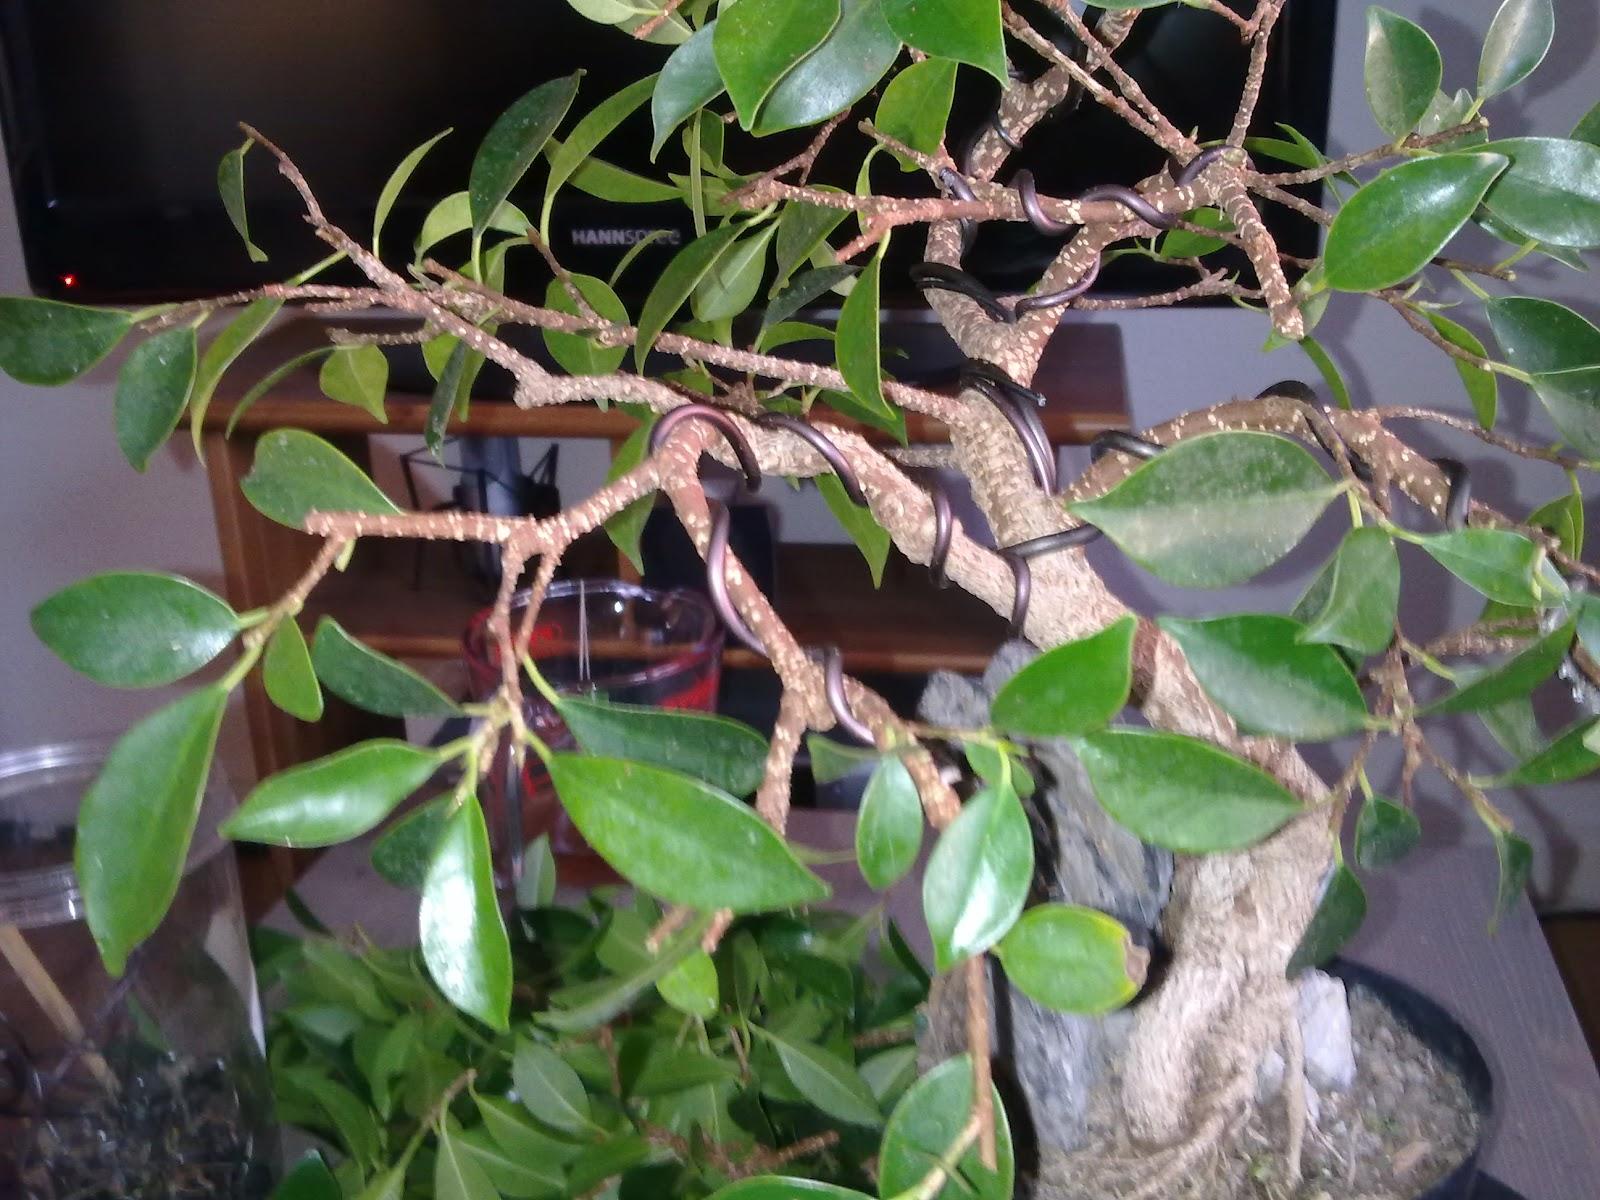 Bonsai | 盆栽 | : Ficus microcarpa, Lorbeerfeige, Gestaltung